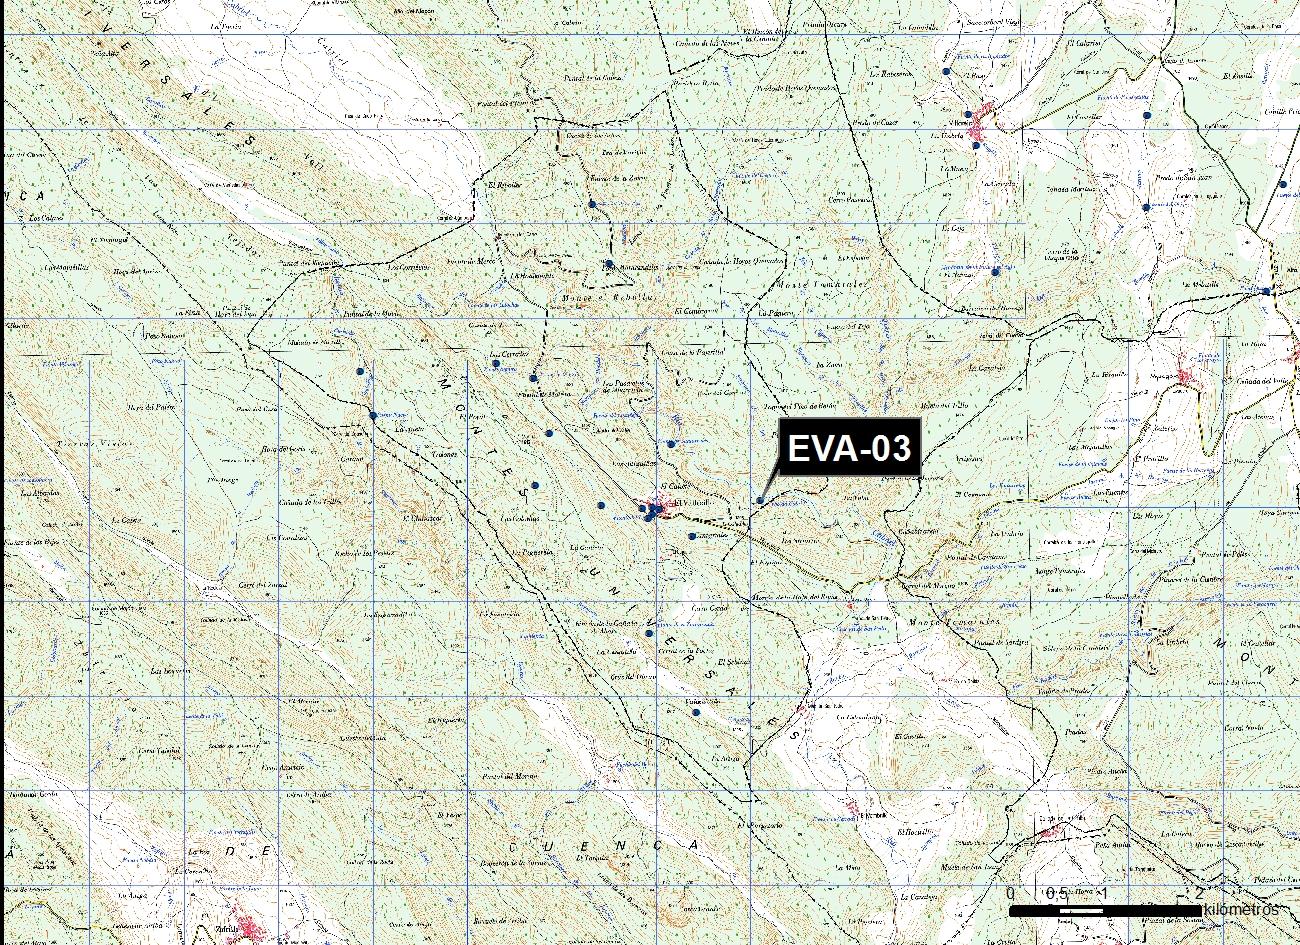 EVA_03_M.V.LOZANO_OJOS DEL CABRIEL_MAP.TOPO 1